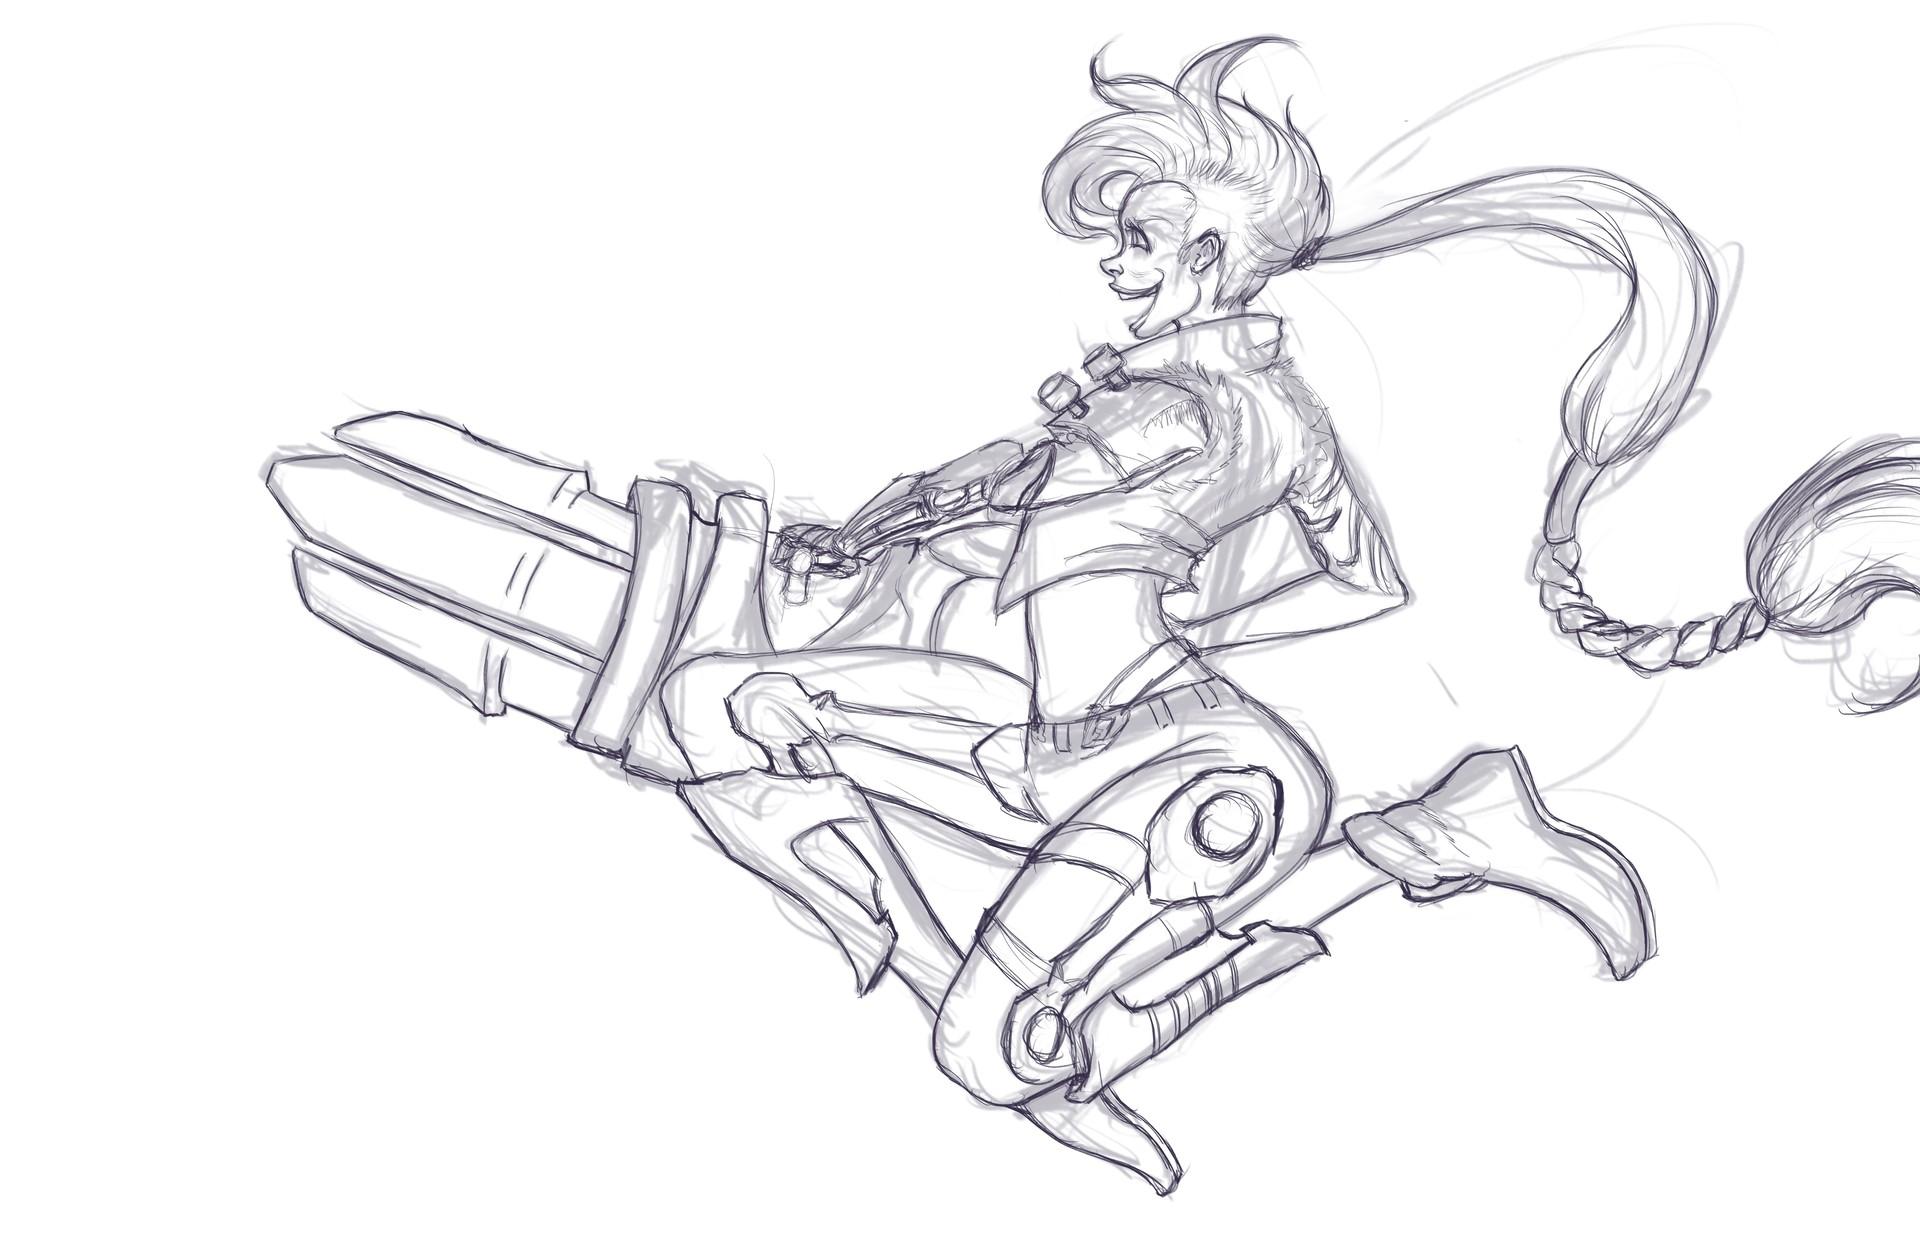 sketch/ lineart